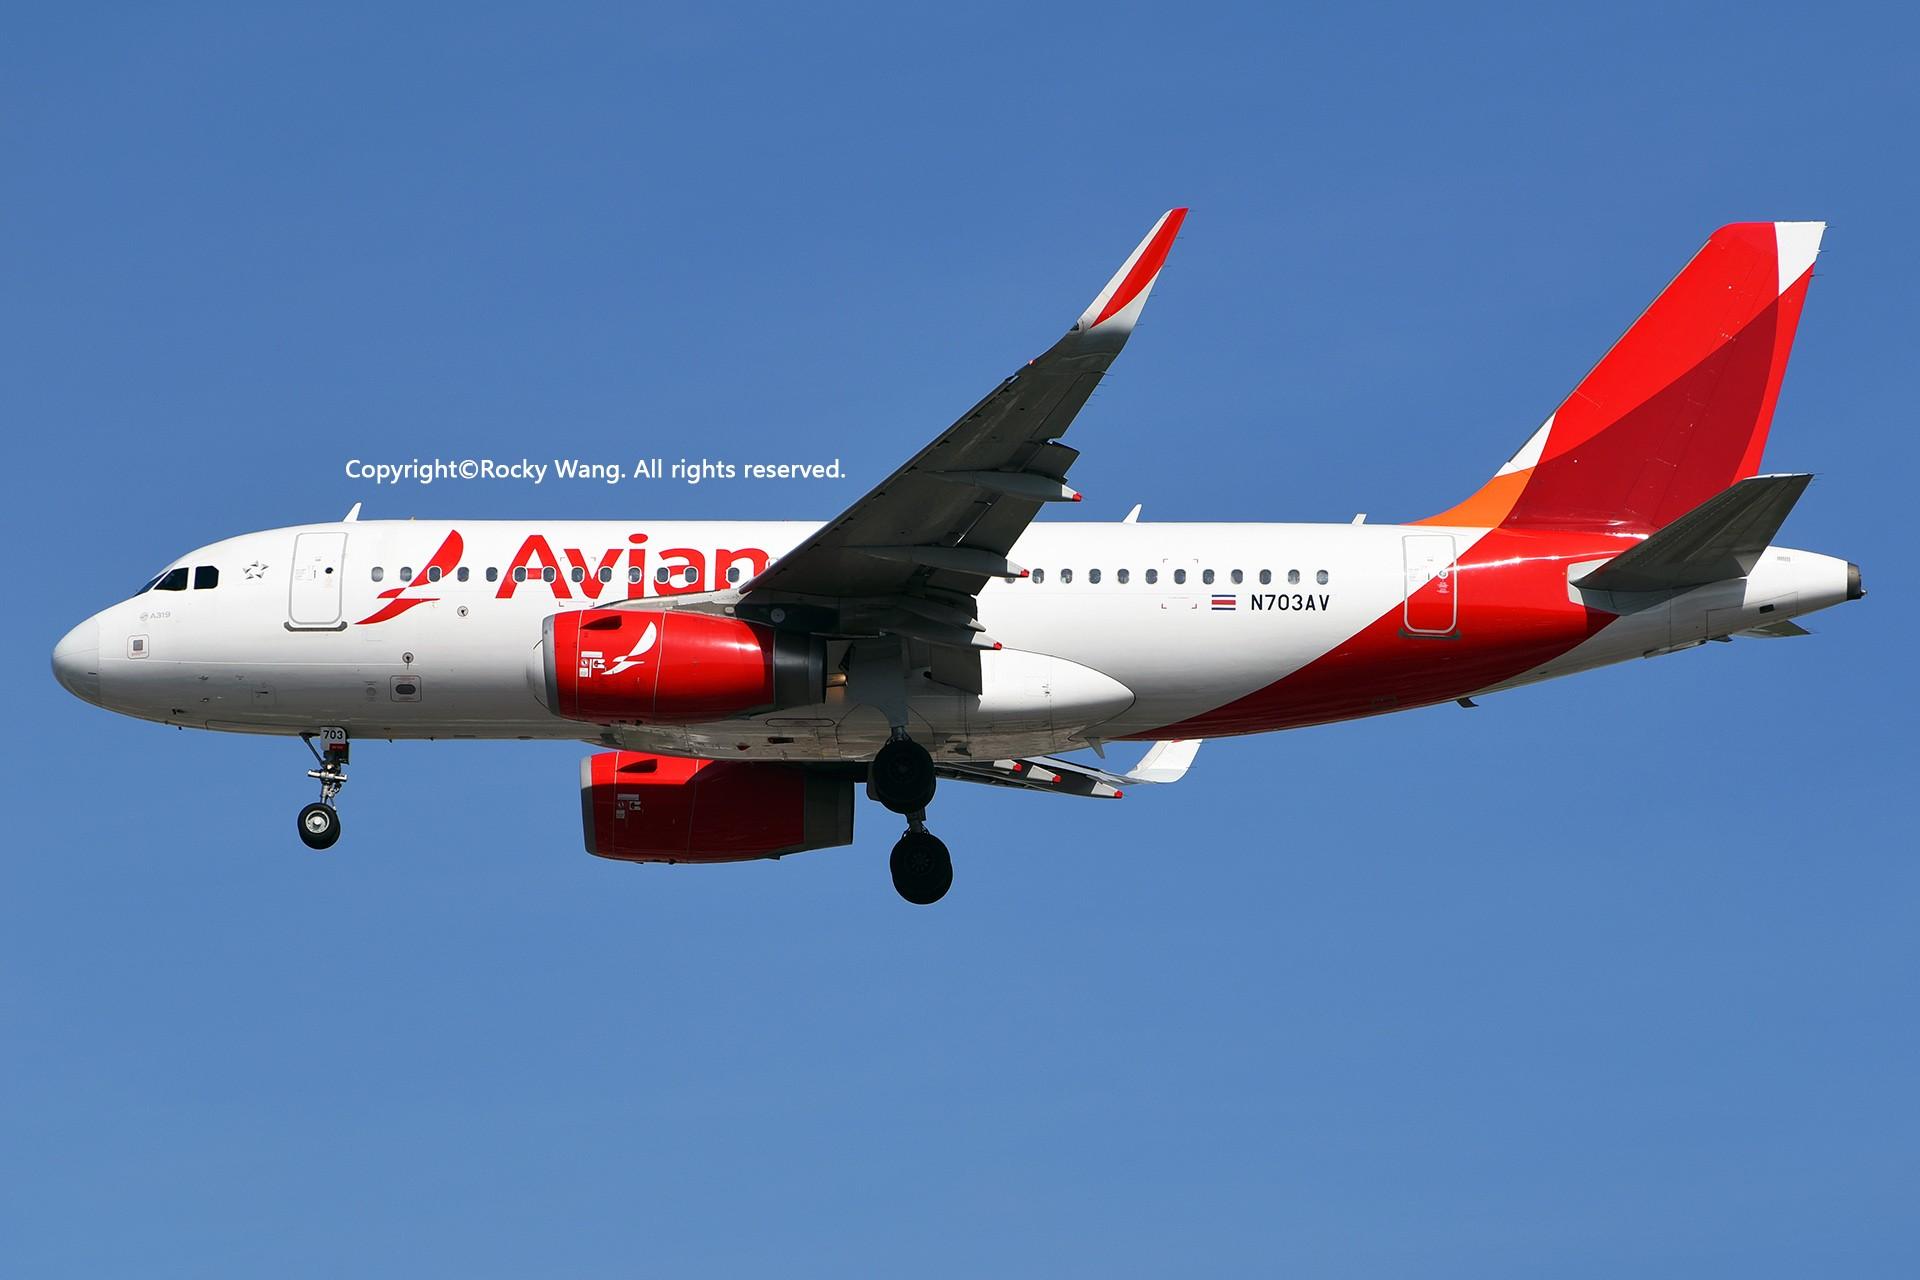 Re:[原创]KMIA 30图 AIRBUS A319-132 N703AV Miami Int'l Airport